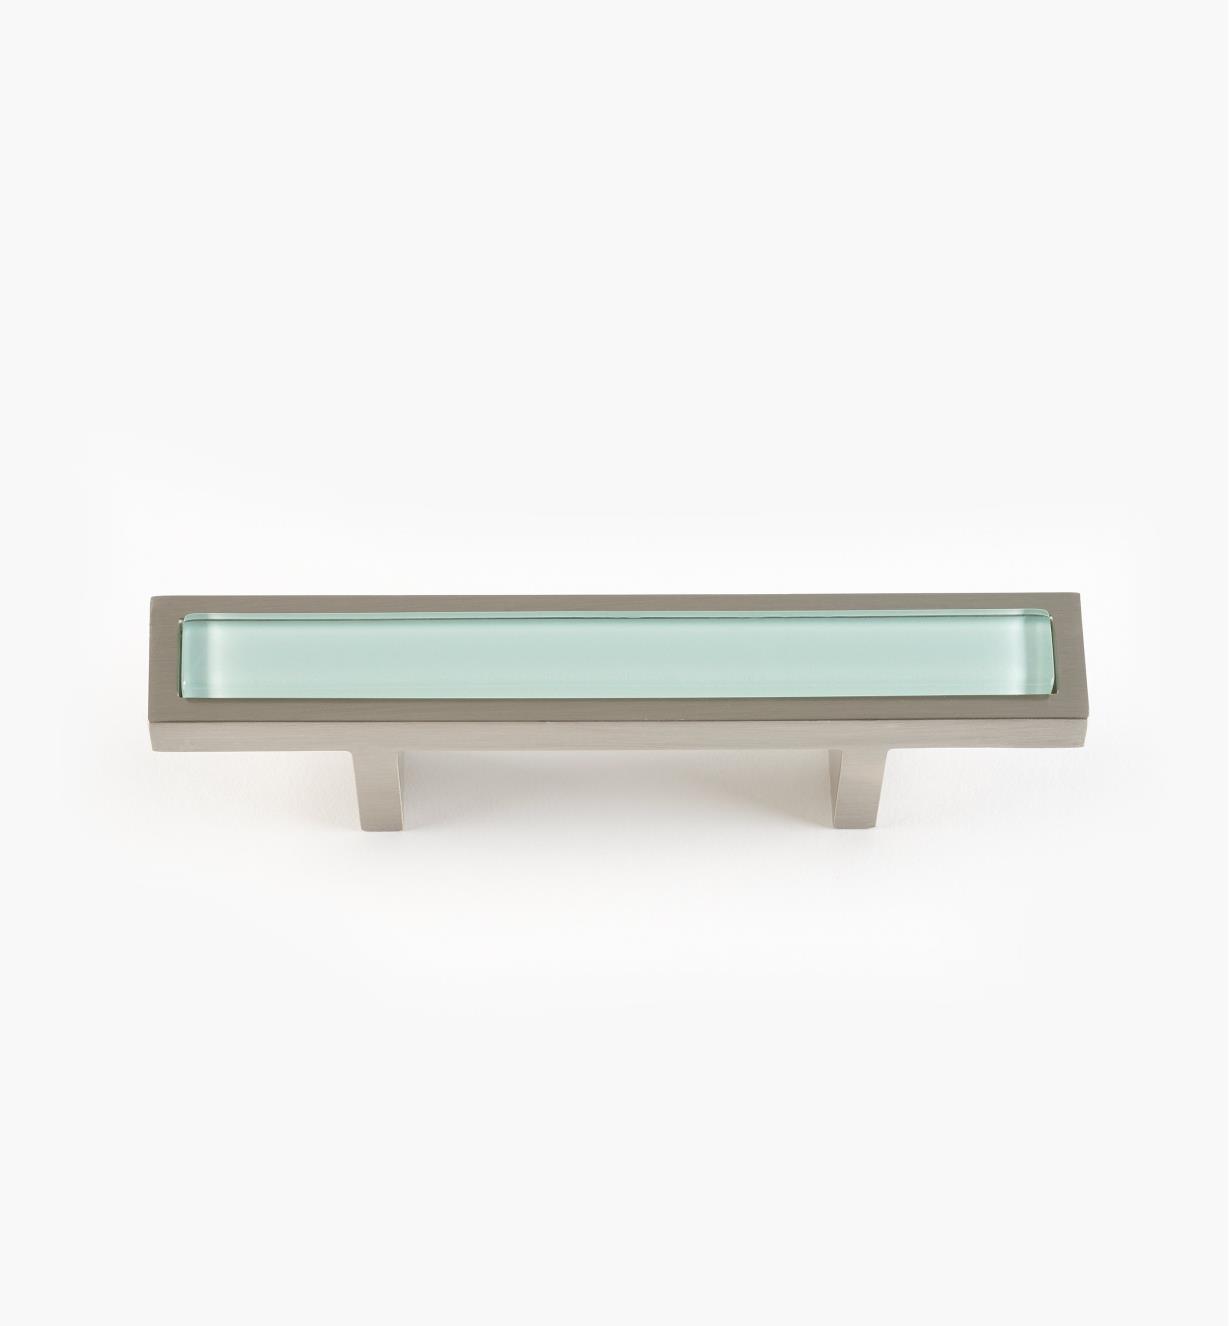 01W5133 - Poignée Spa, turquoise, fini nickel brossé, 5 3/4 po